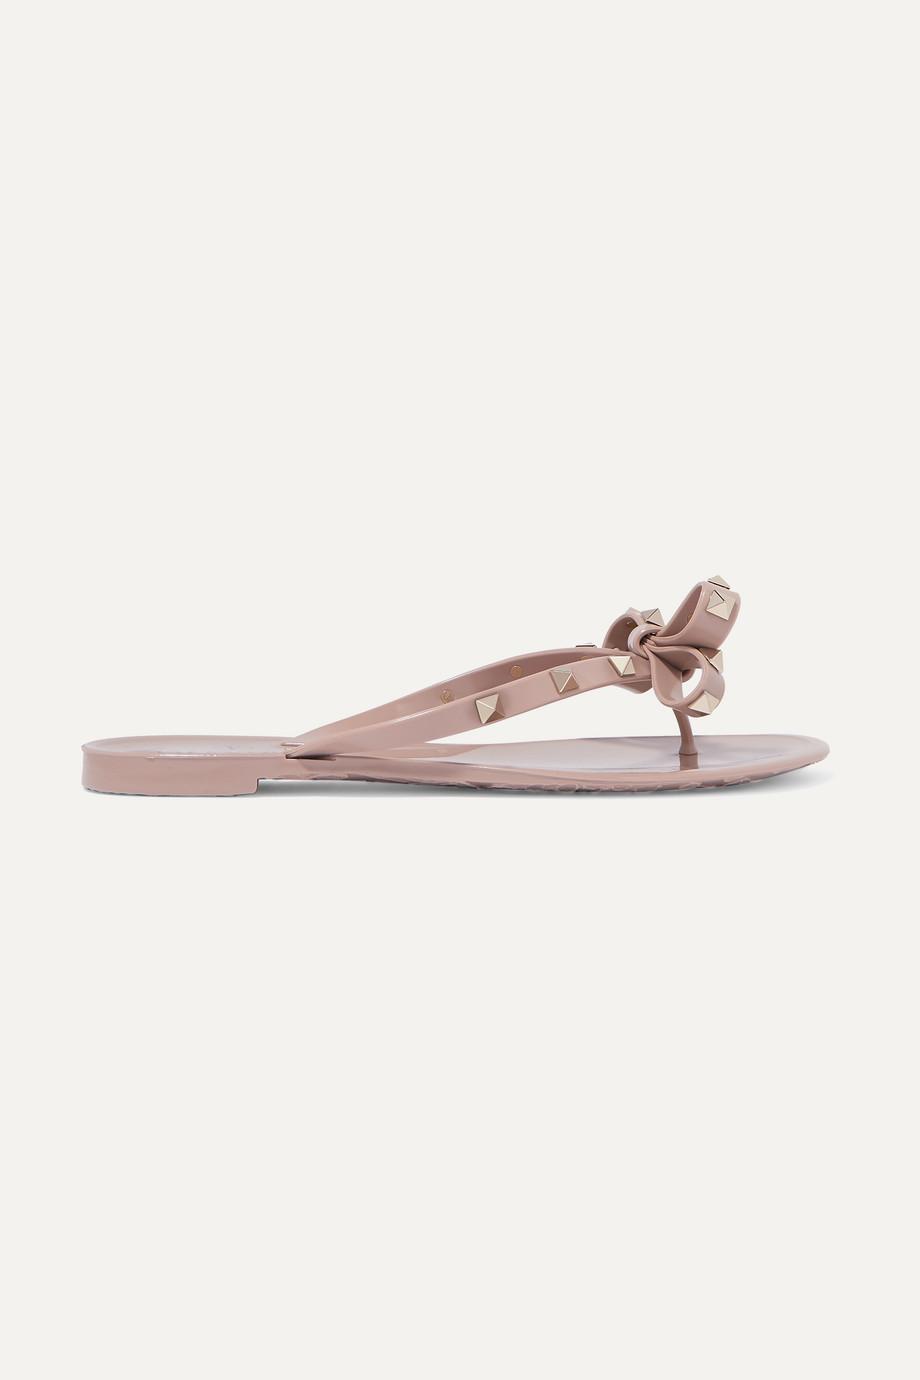 Valentino Valentino Garavani The Rockstud rubber sandals